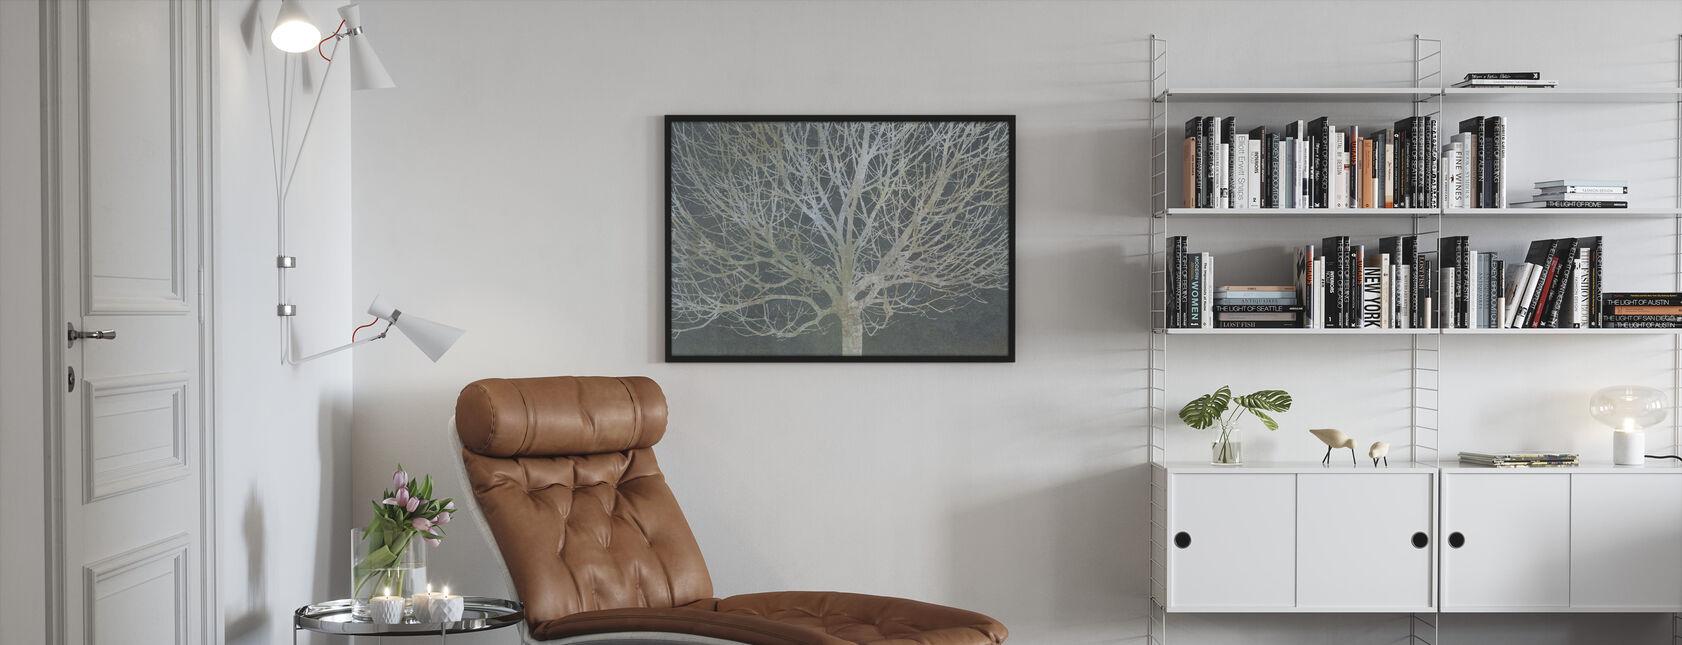 Árboles de Plata - Print enmarcado - Salón